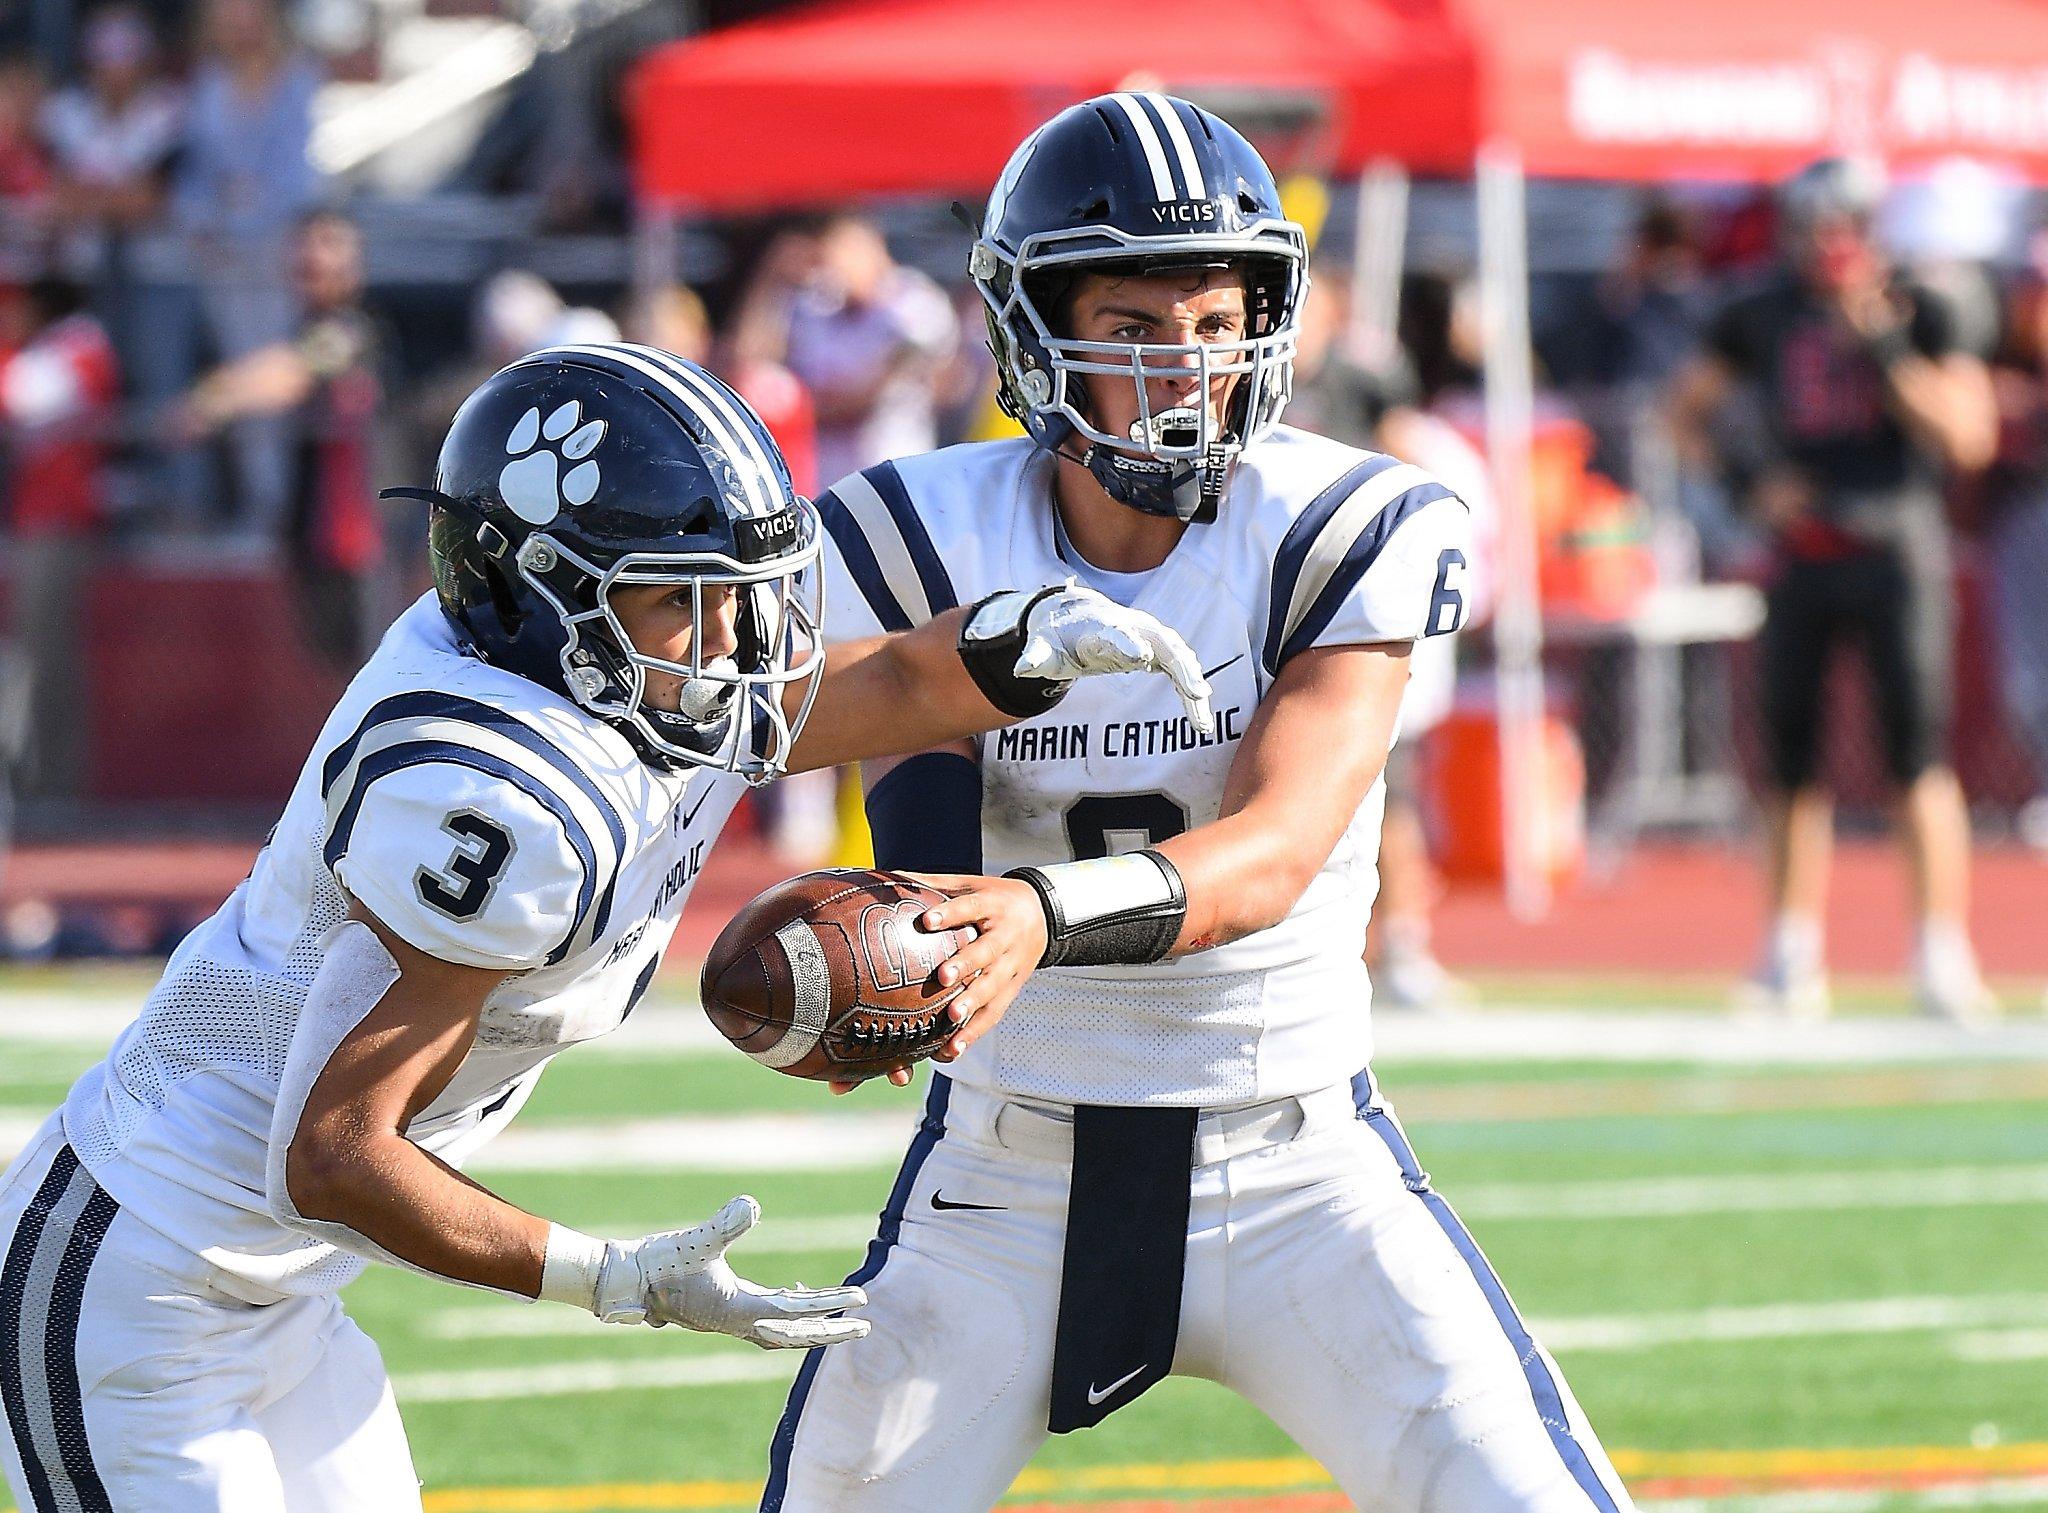 Marin Catholic harbors football title hopes - San Francisco Chronicle